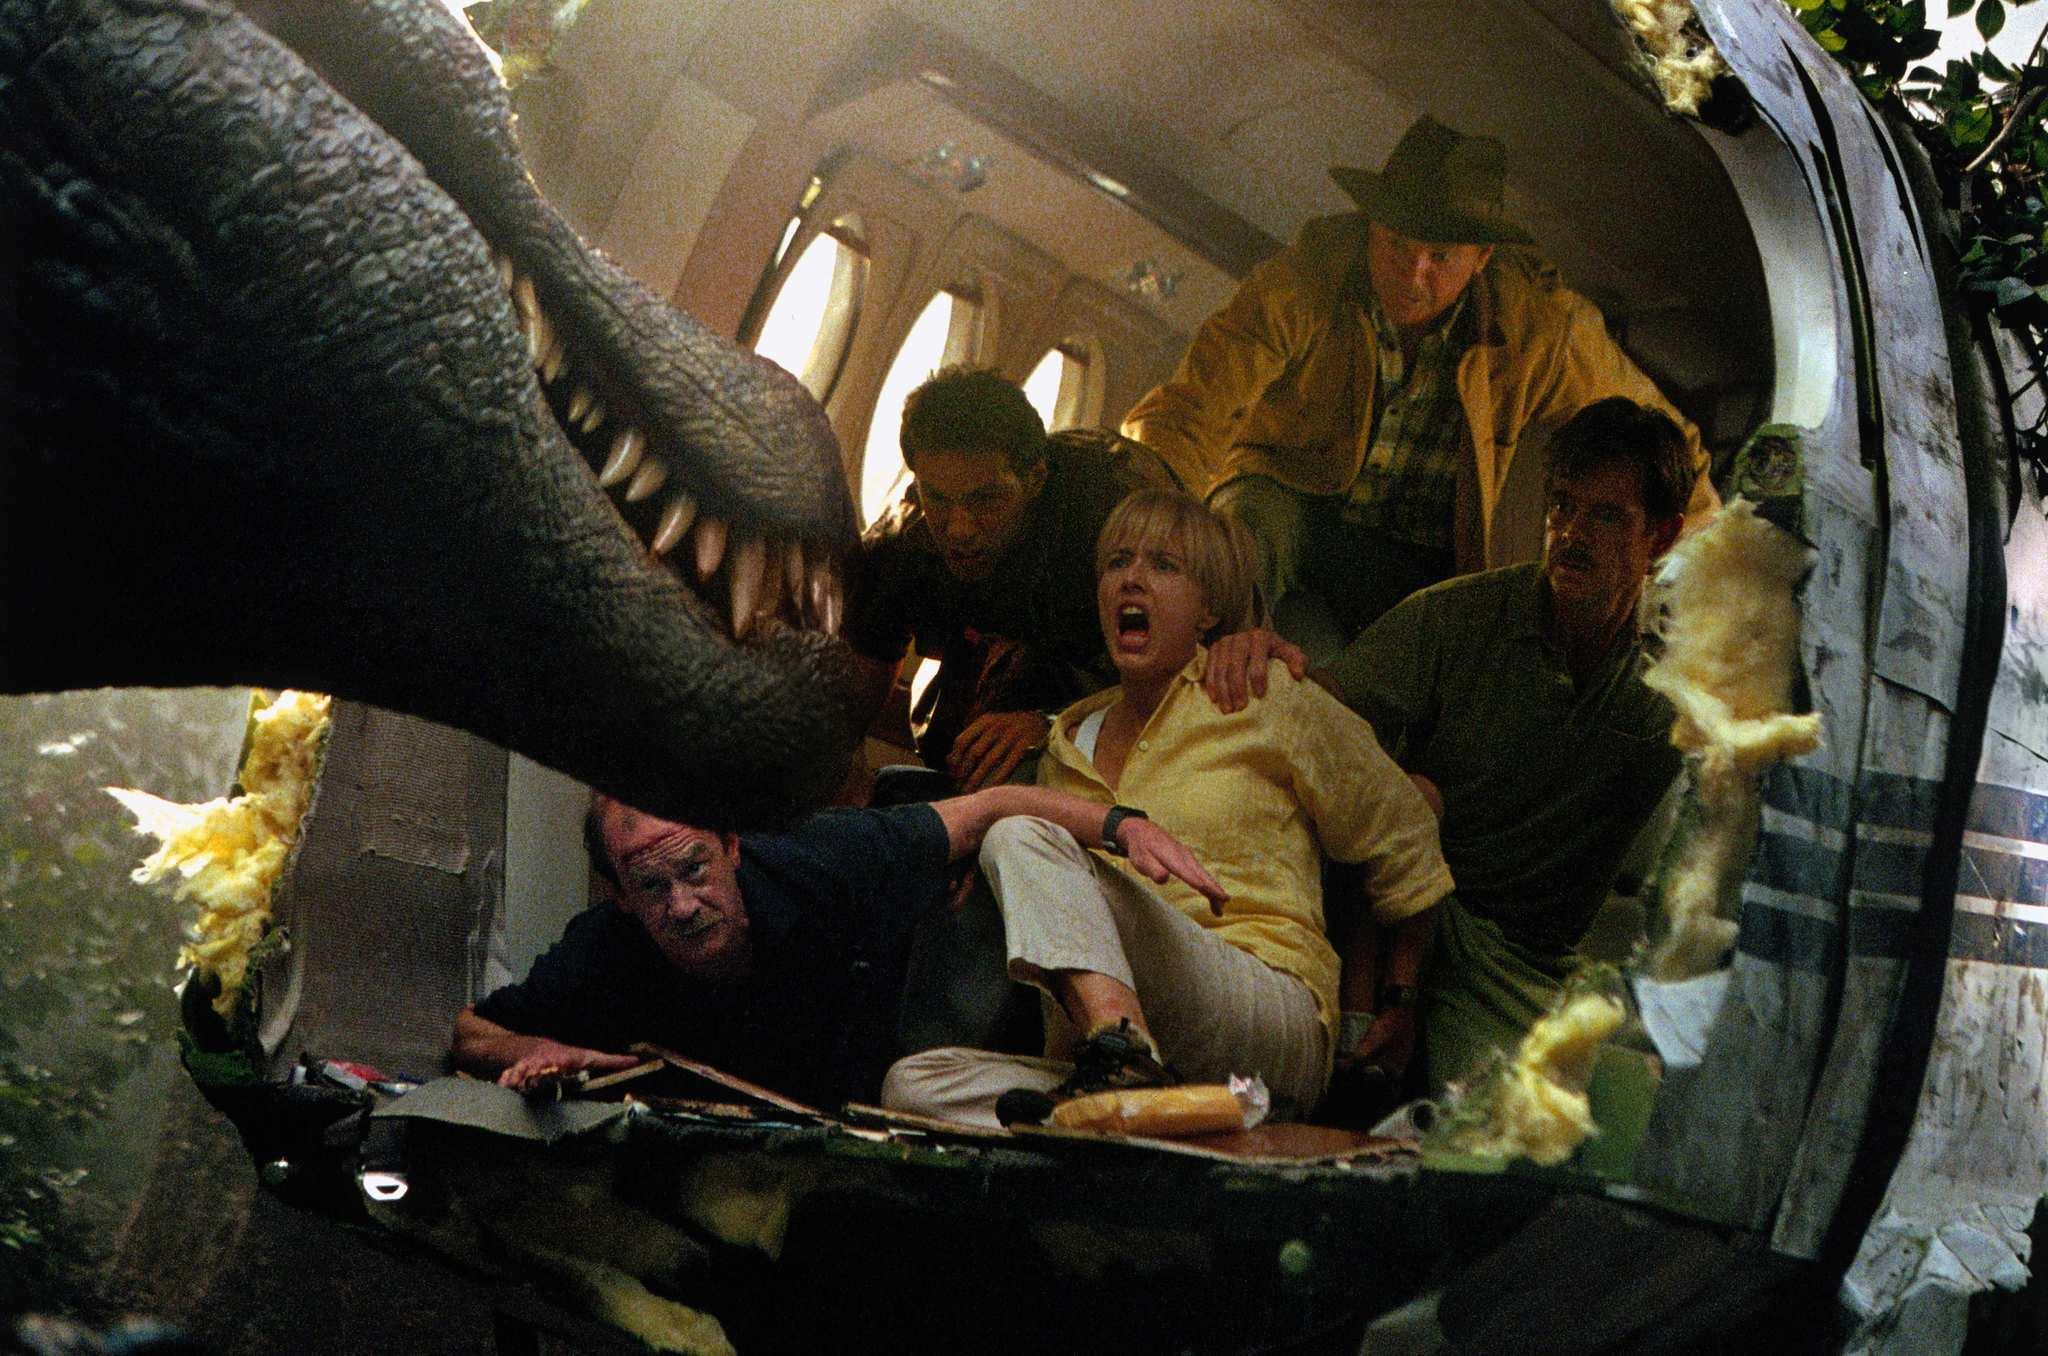 Jurassic Park II sequel